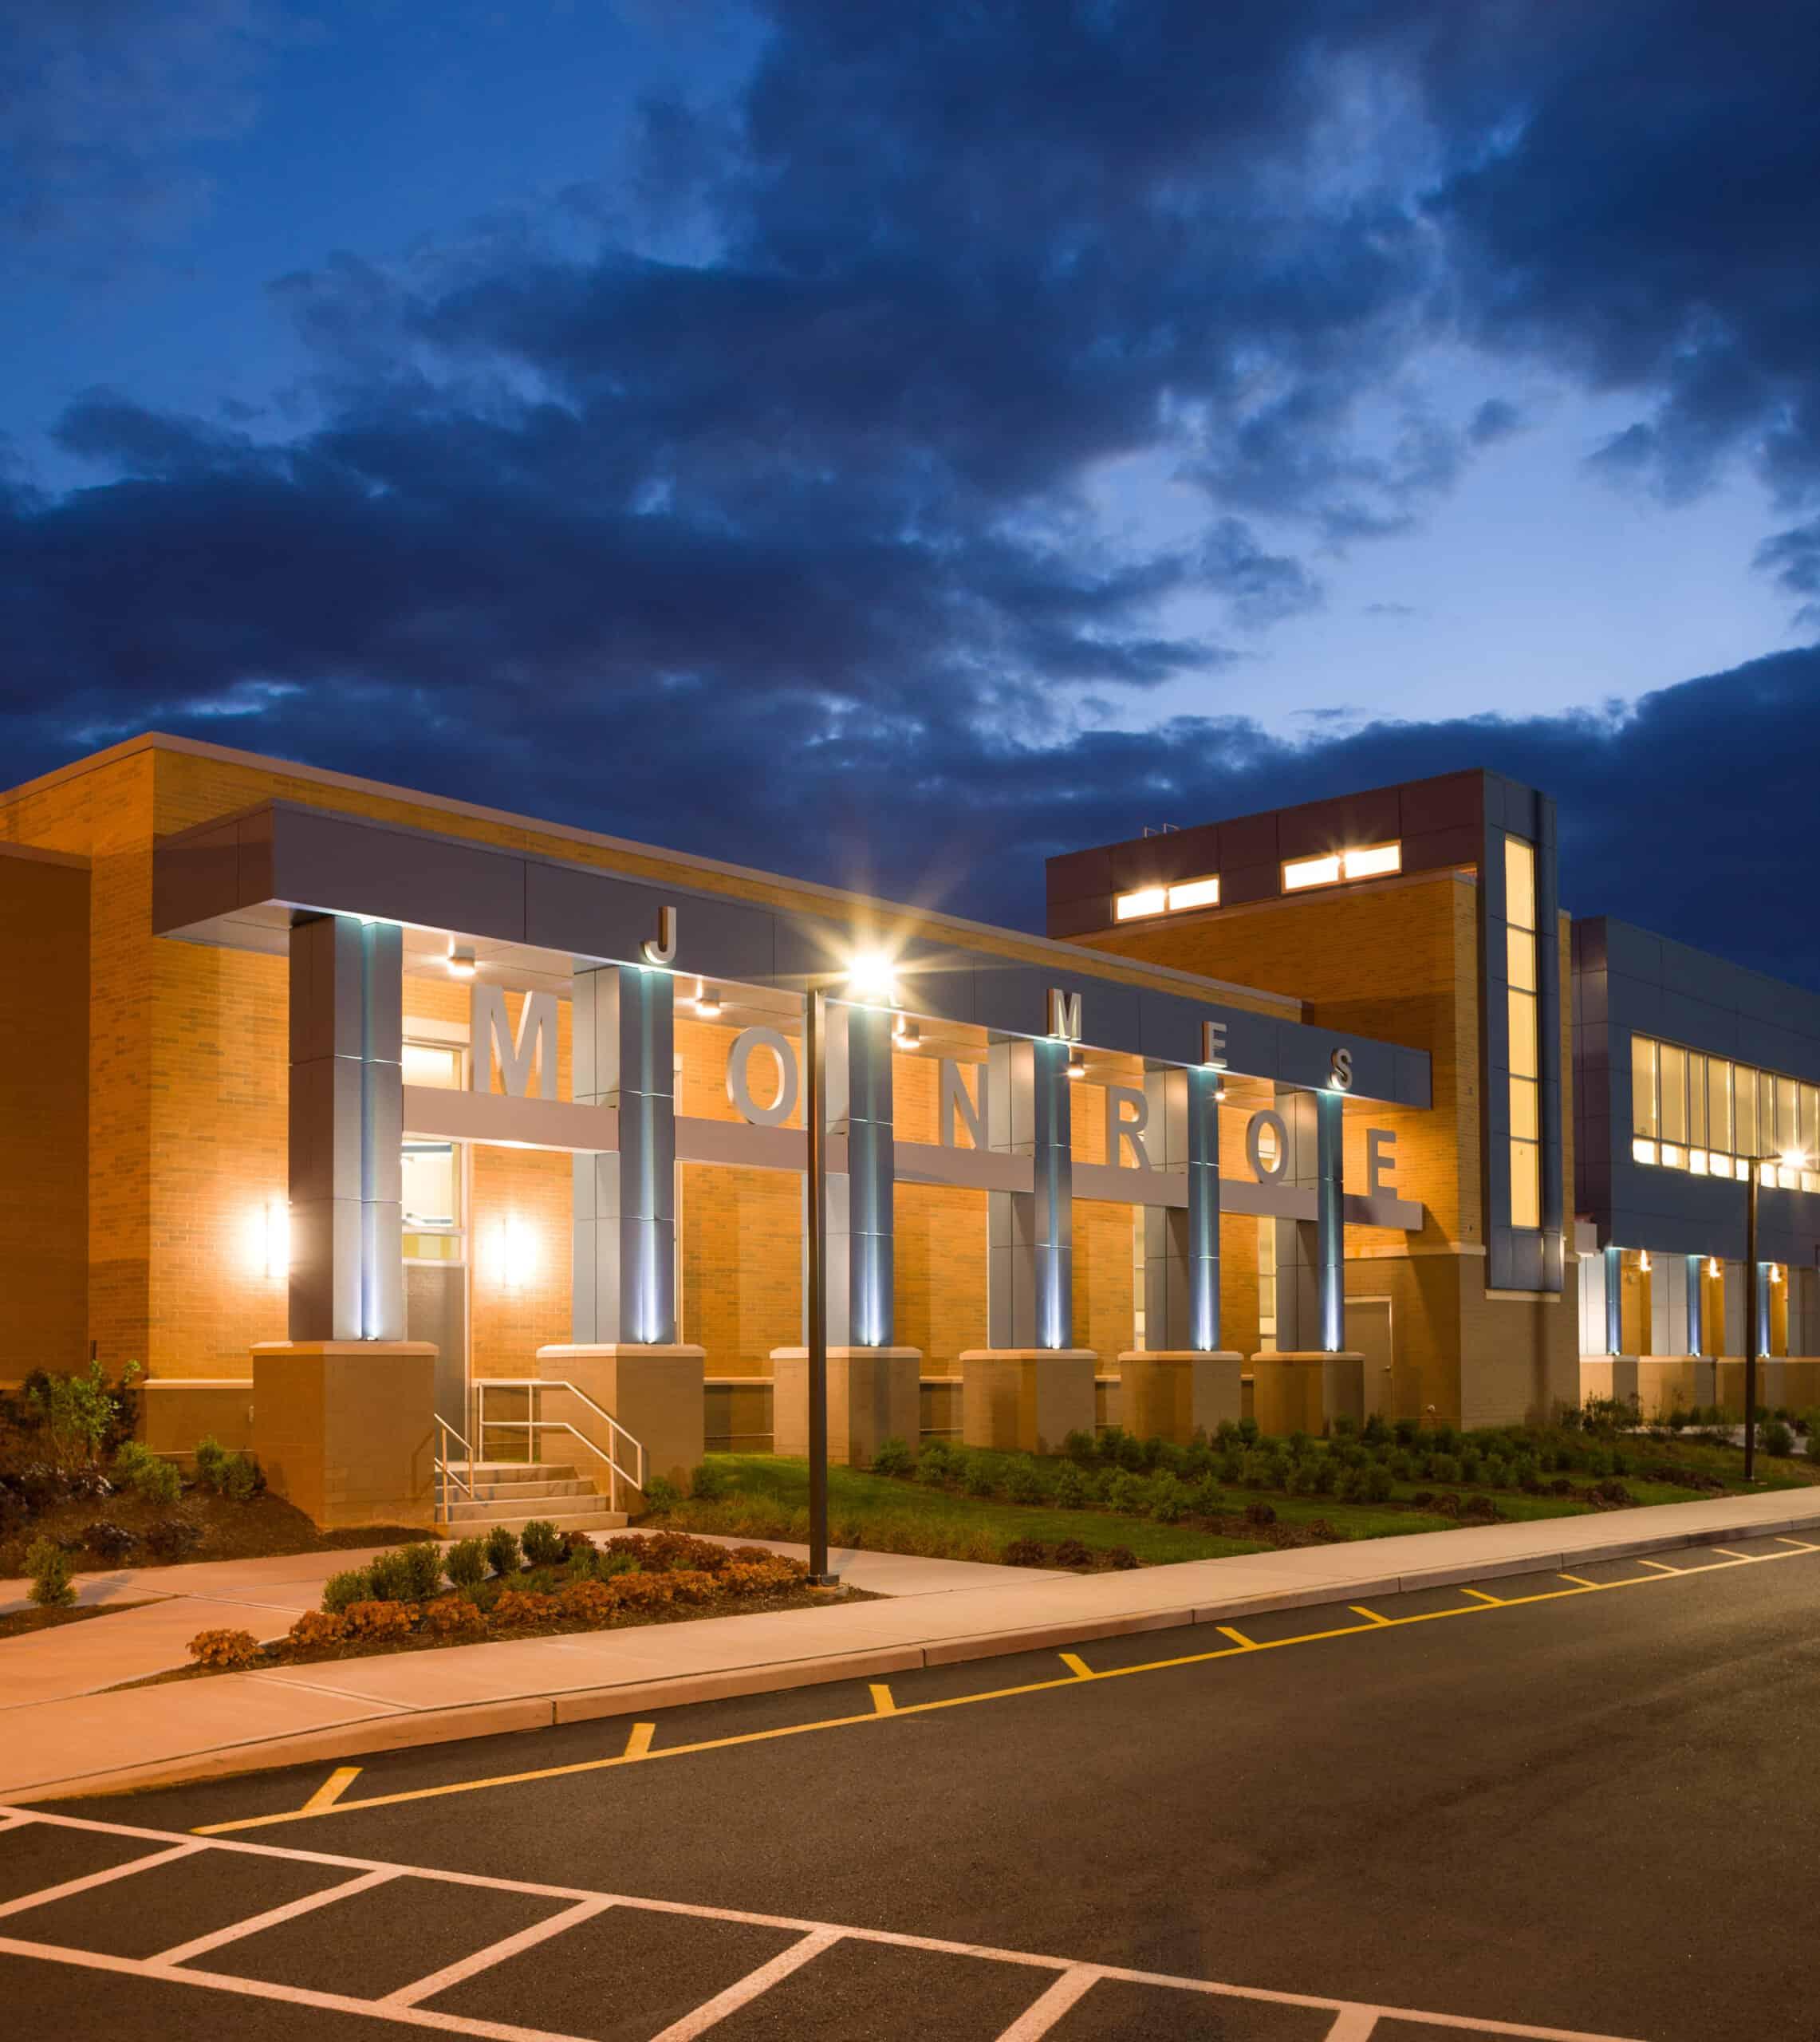 James Monroe Elementary School